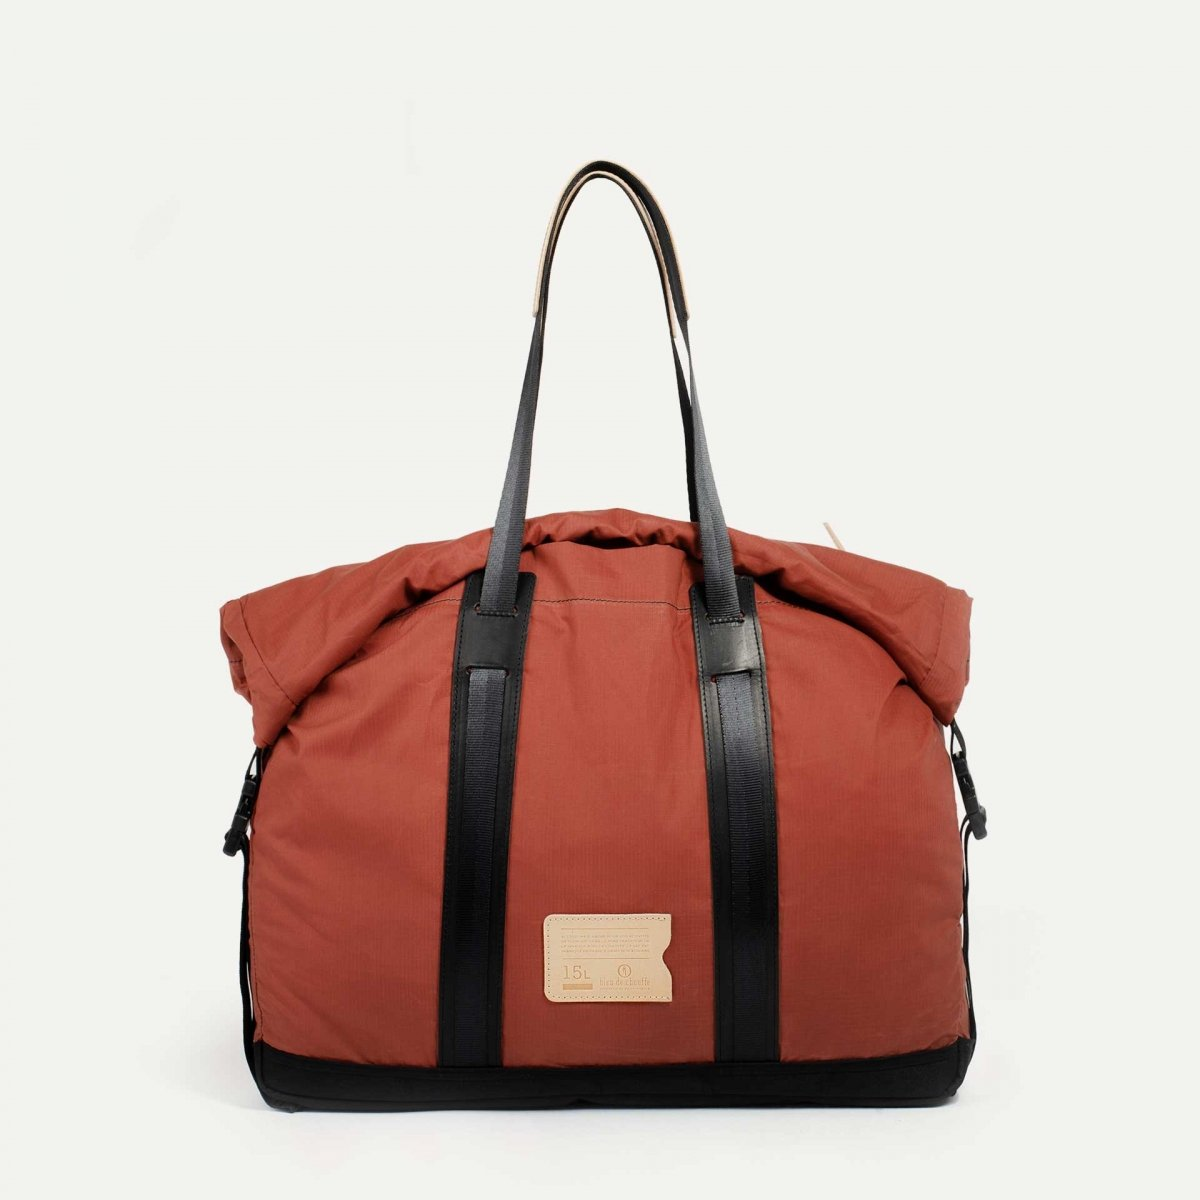 15L Barda Tote bag - Burgundy (image n°1)